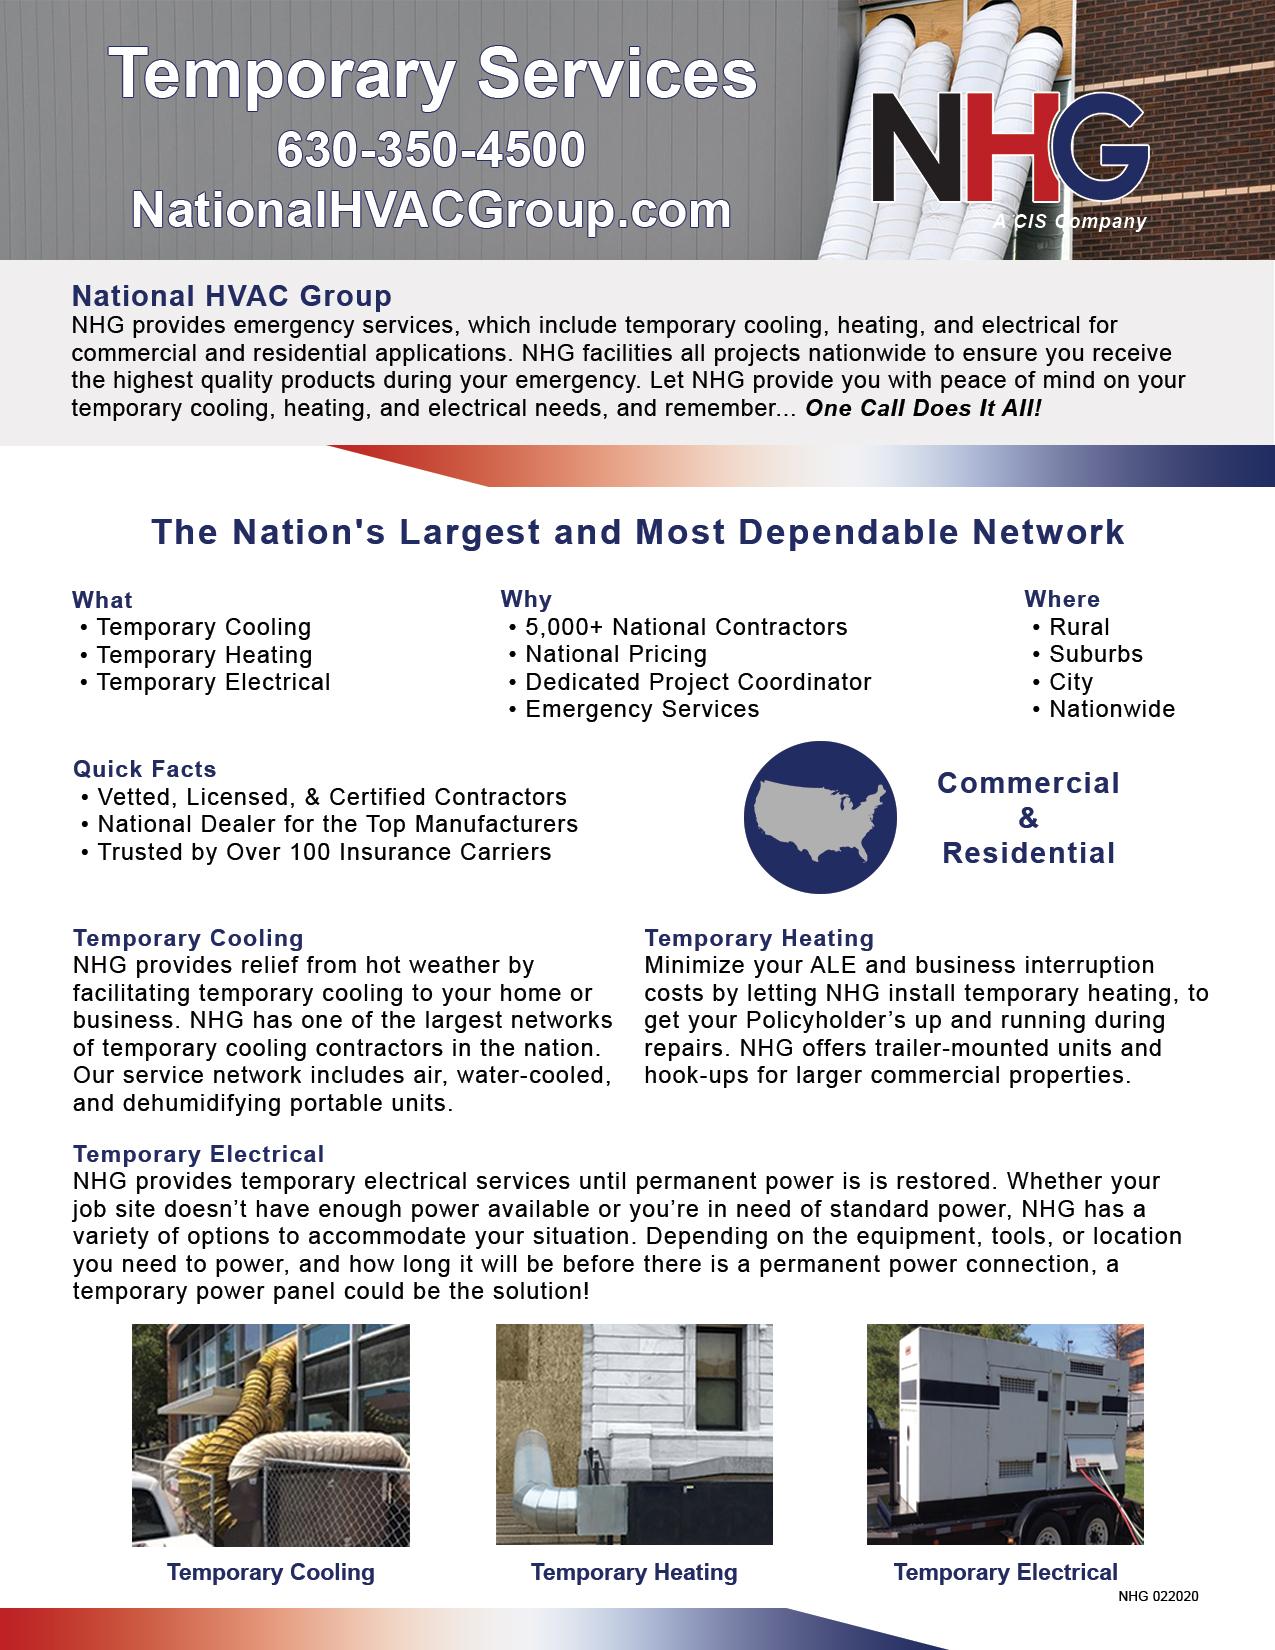 NHG Temporary Services